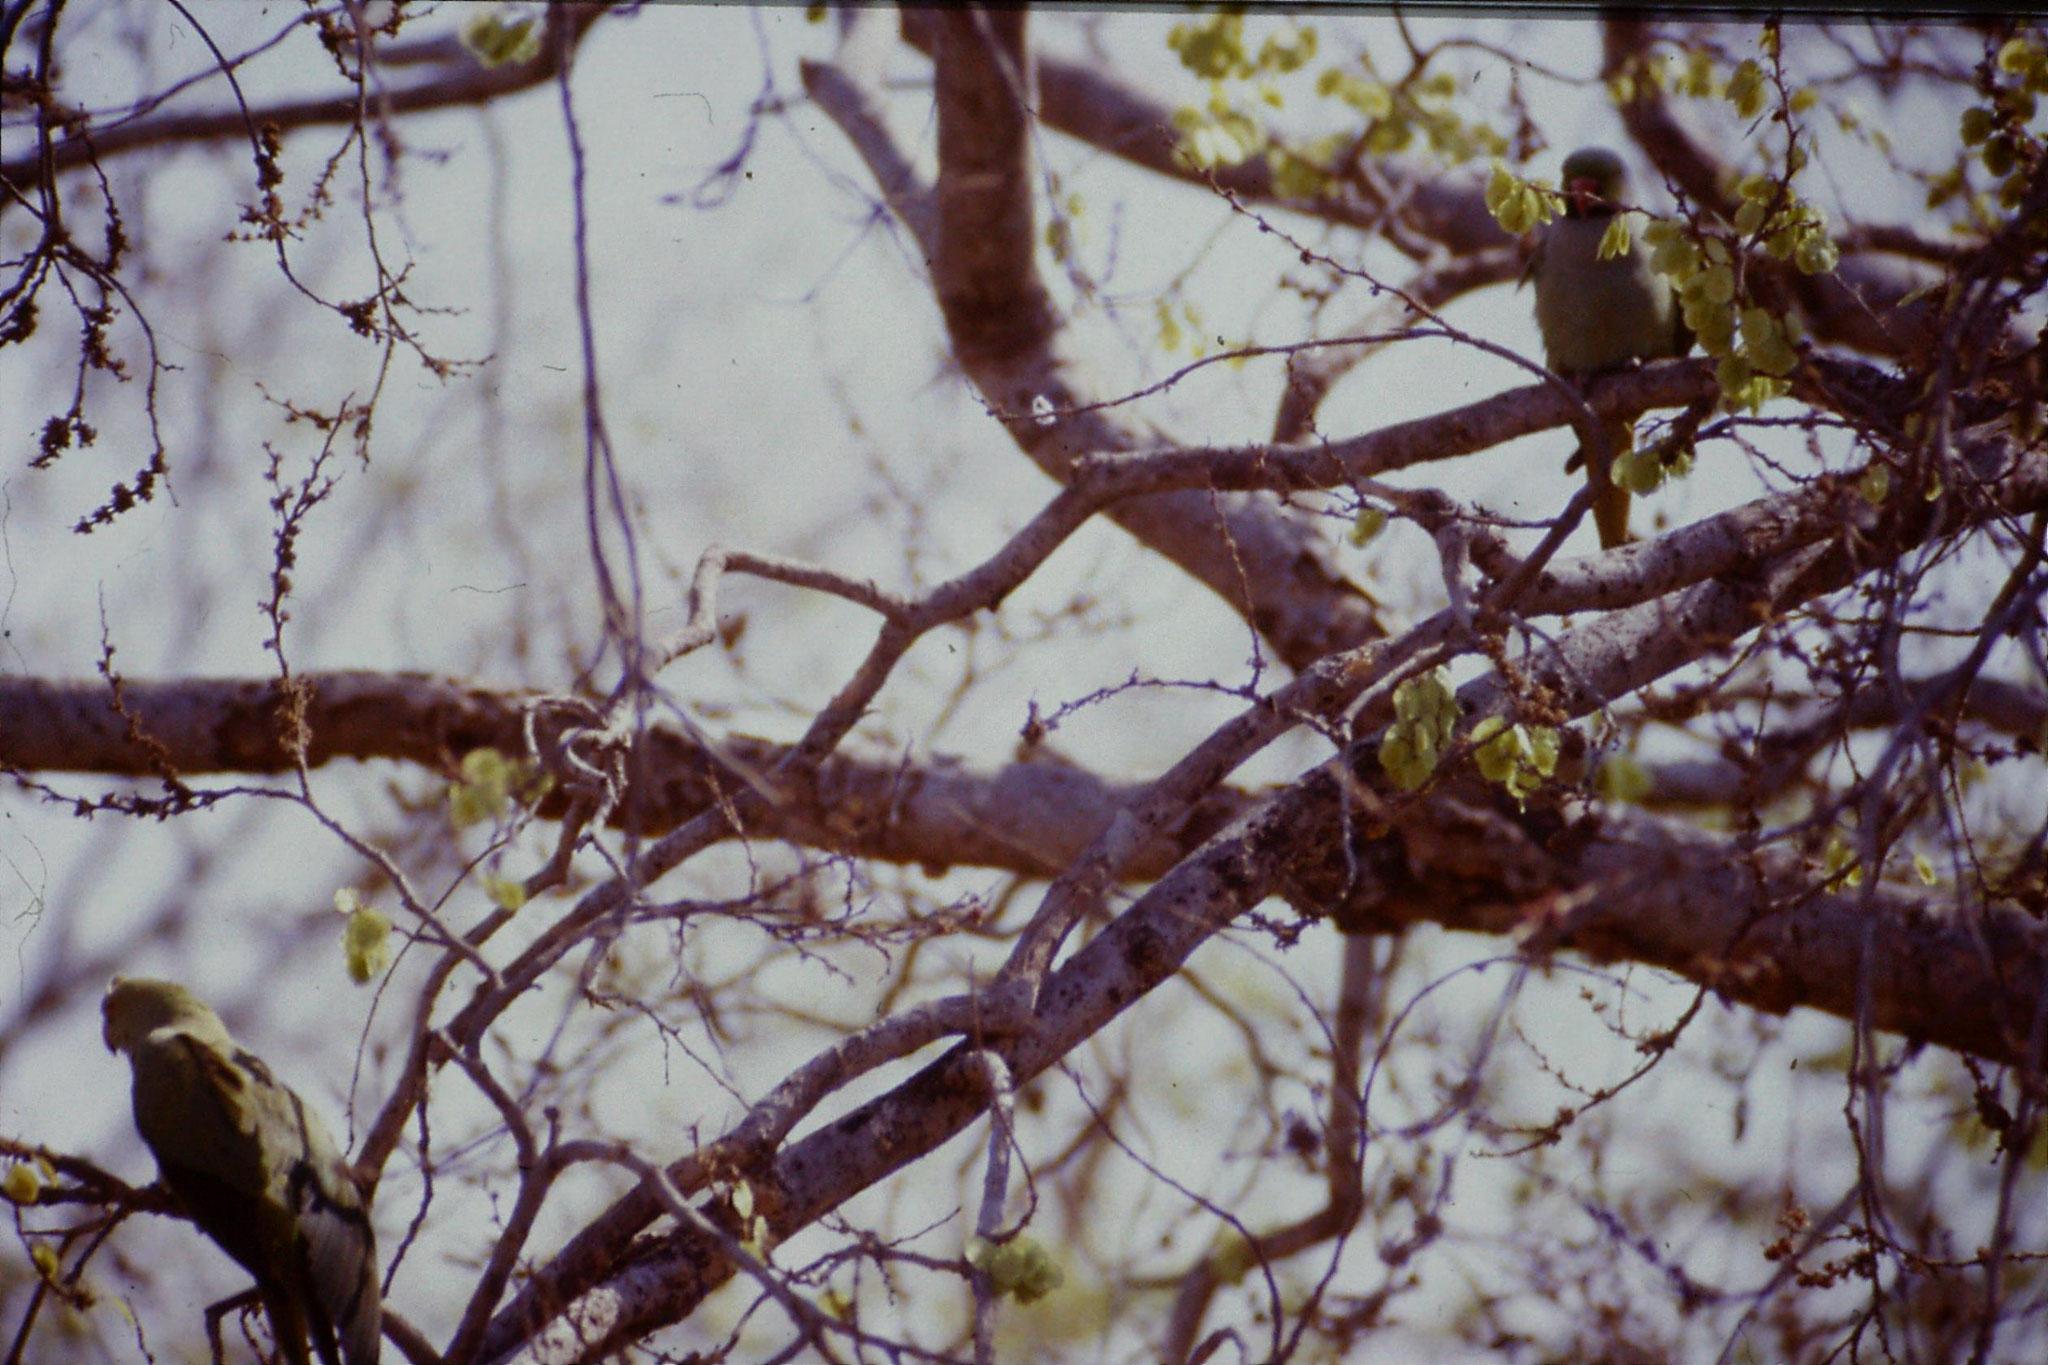 109/13: 31/3/1990 Fatehpur Sikri - parakeets